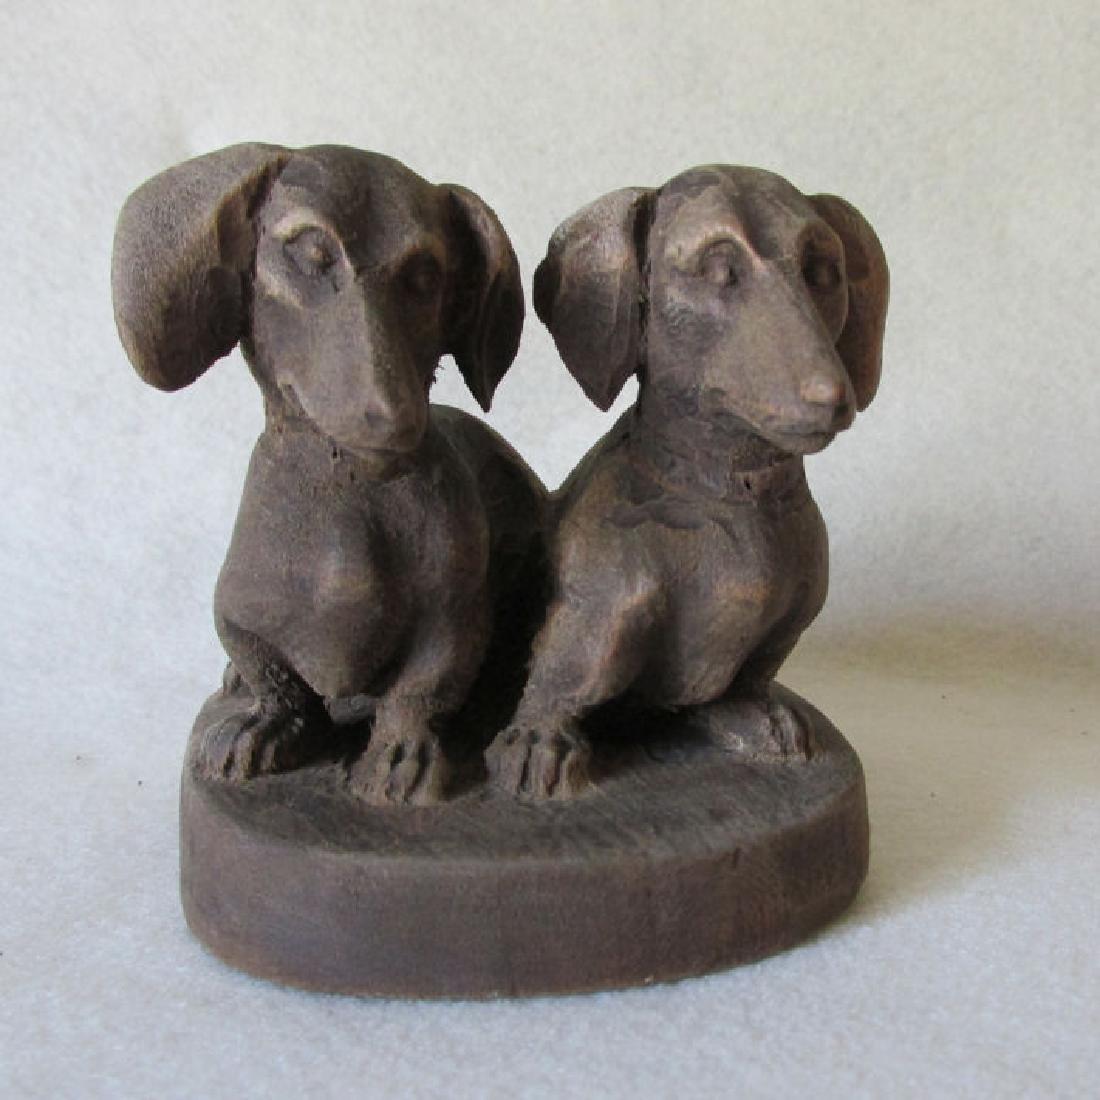 Vintage Folk Art Wood Carving of Dachshund Dogs